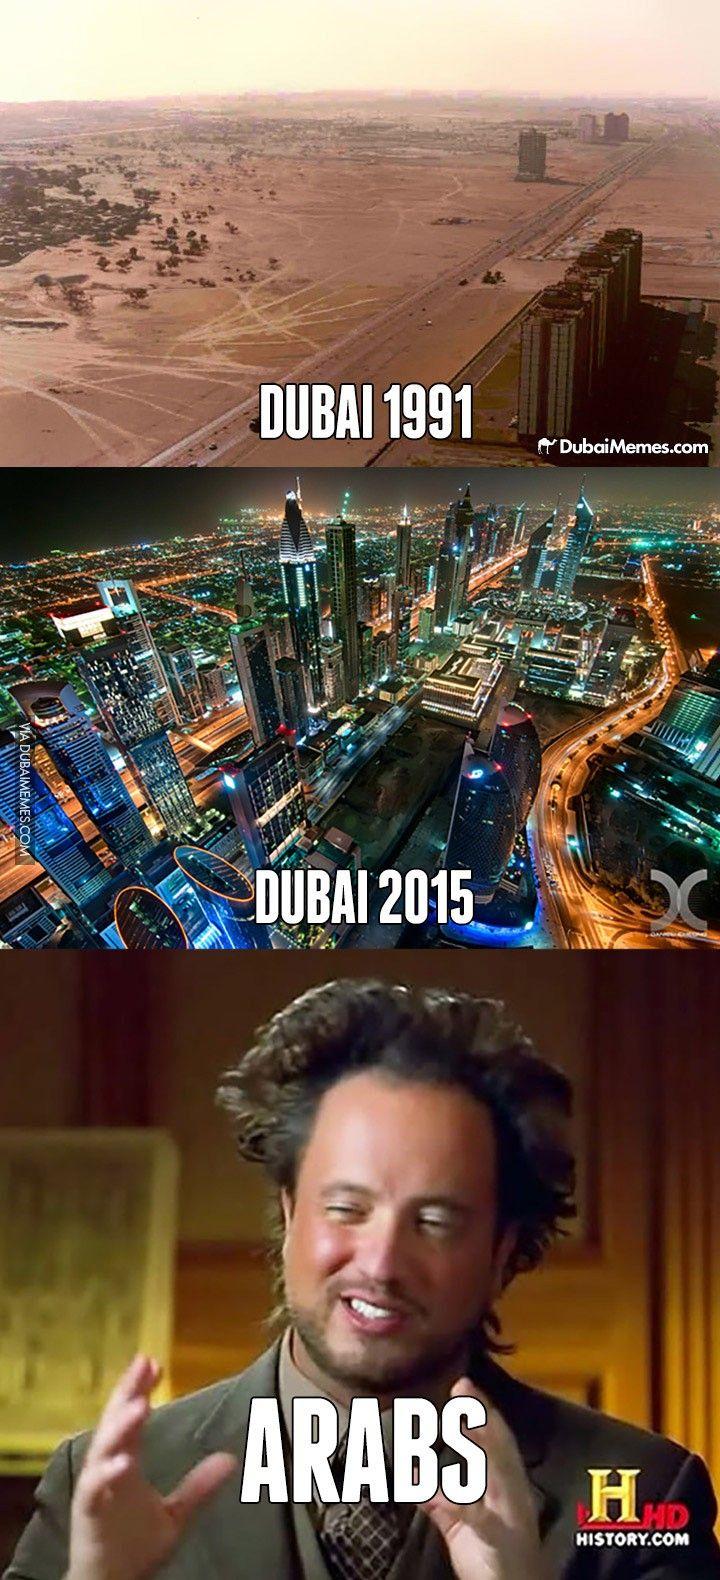 Dubai Before and After... Rapid Speed Of Urban Development #dubai #onlyindubai #dubaiproblems #dxb #dubailife #uae #mydubai #sharjah #abudhabi #alain #dubaiexpat #dubaimemes #dubaimall #myuae